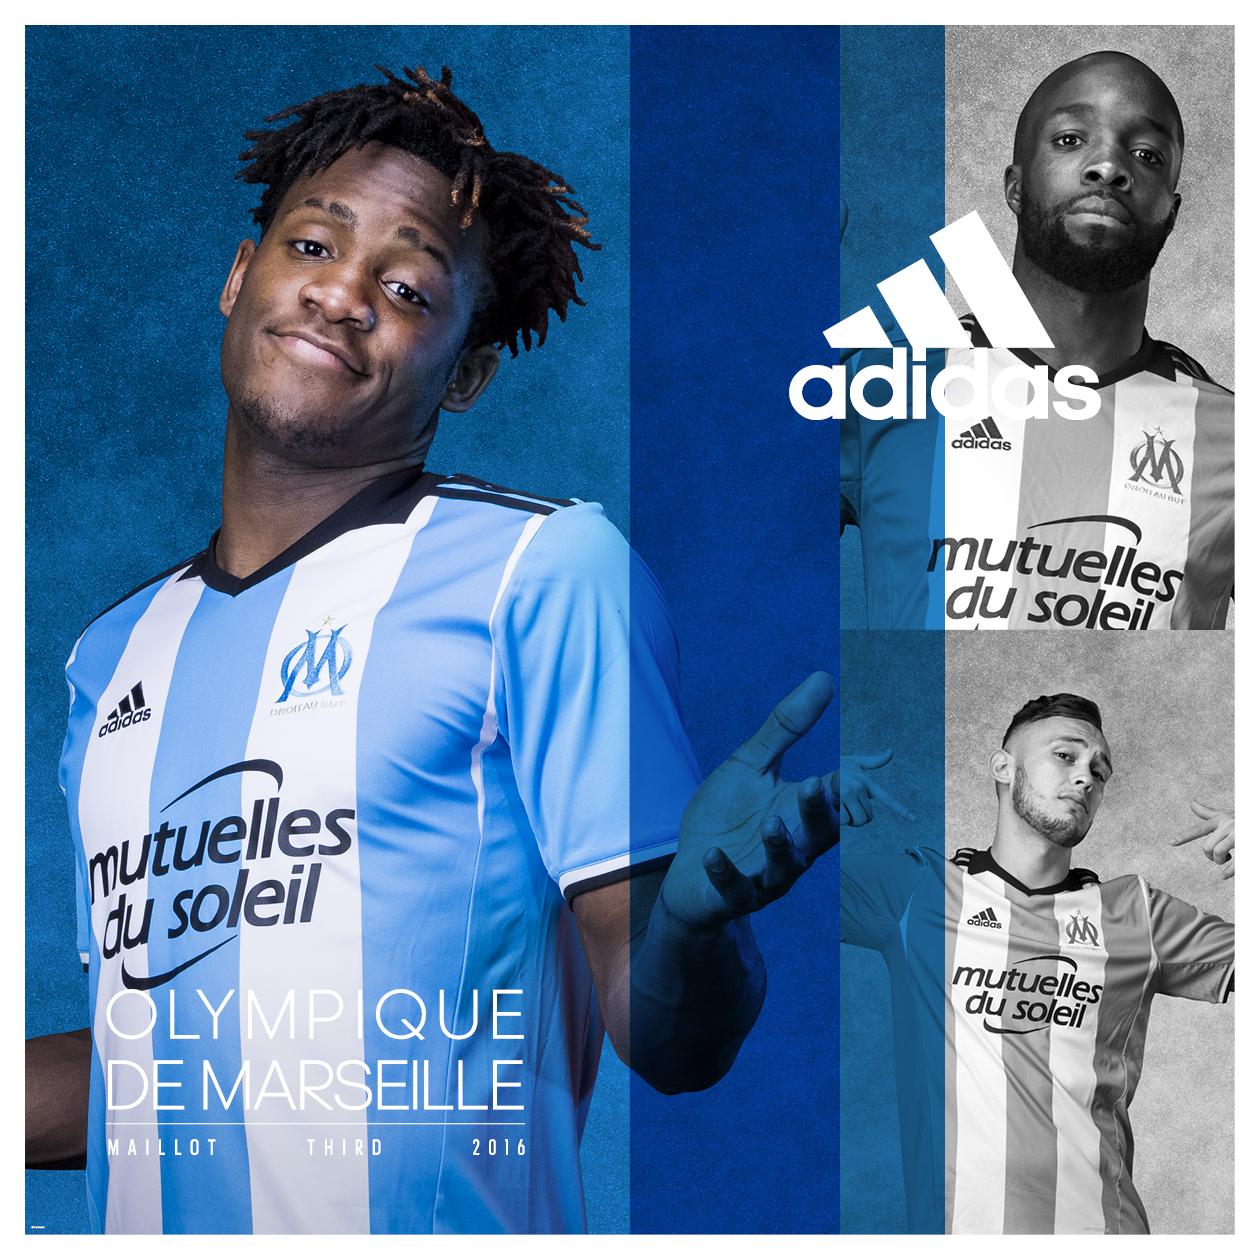 nouveau maillot OM argentine 2017 adidas football